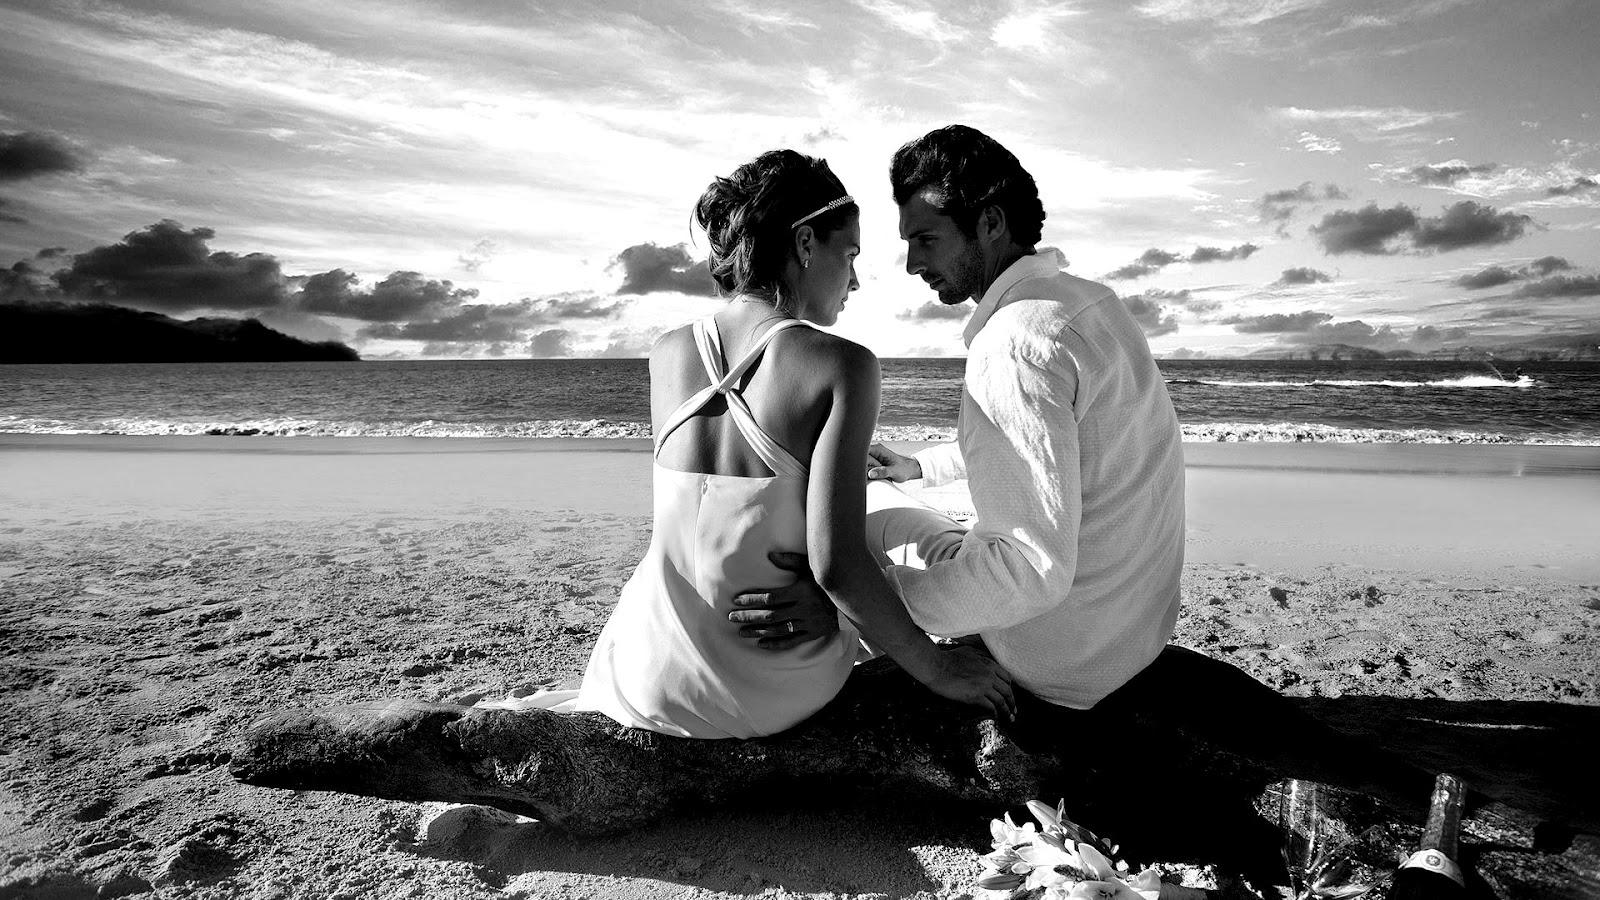 Черно-белые фото влюбленных, фото, черно-белые фото, разное